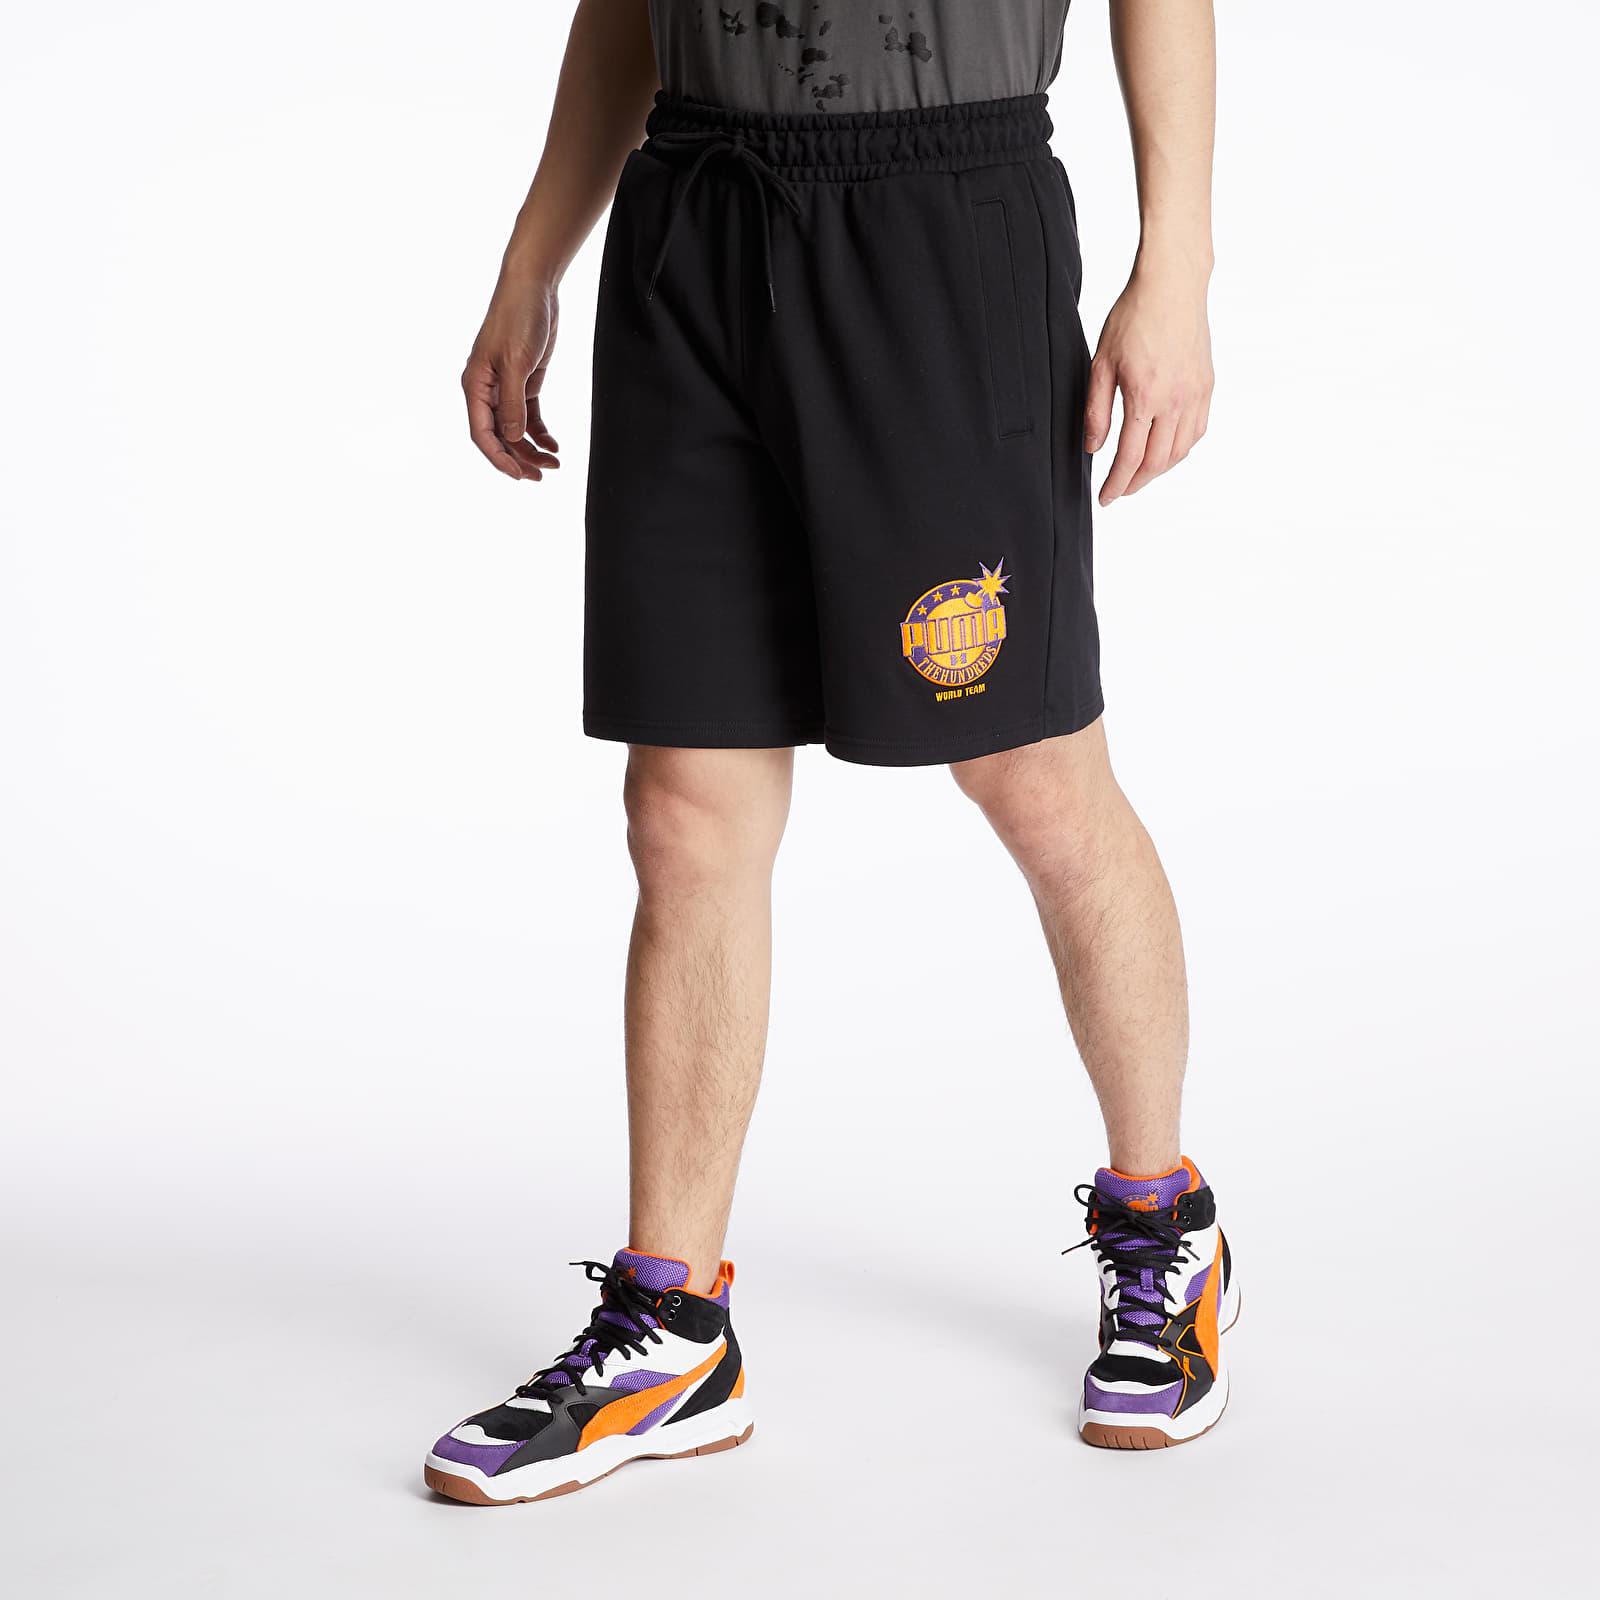 Puma x The Hundreds Shorts